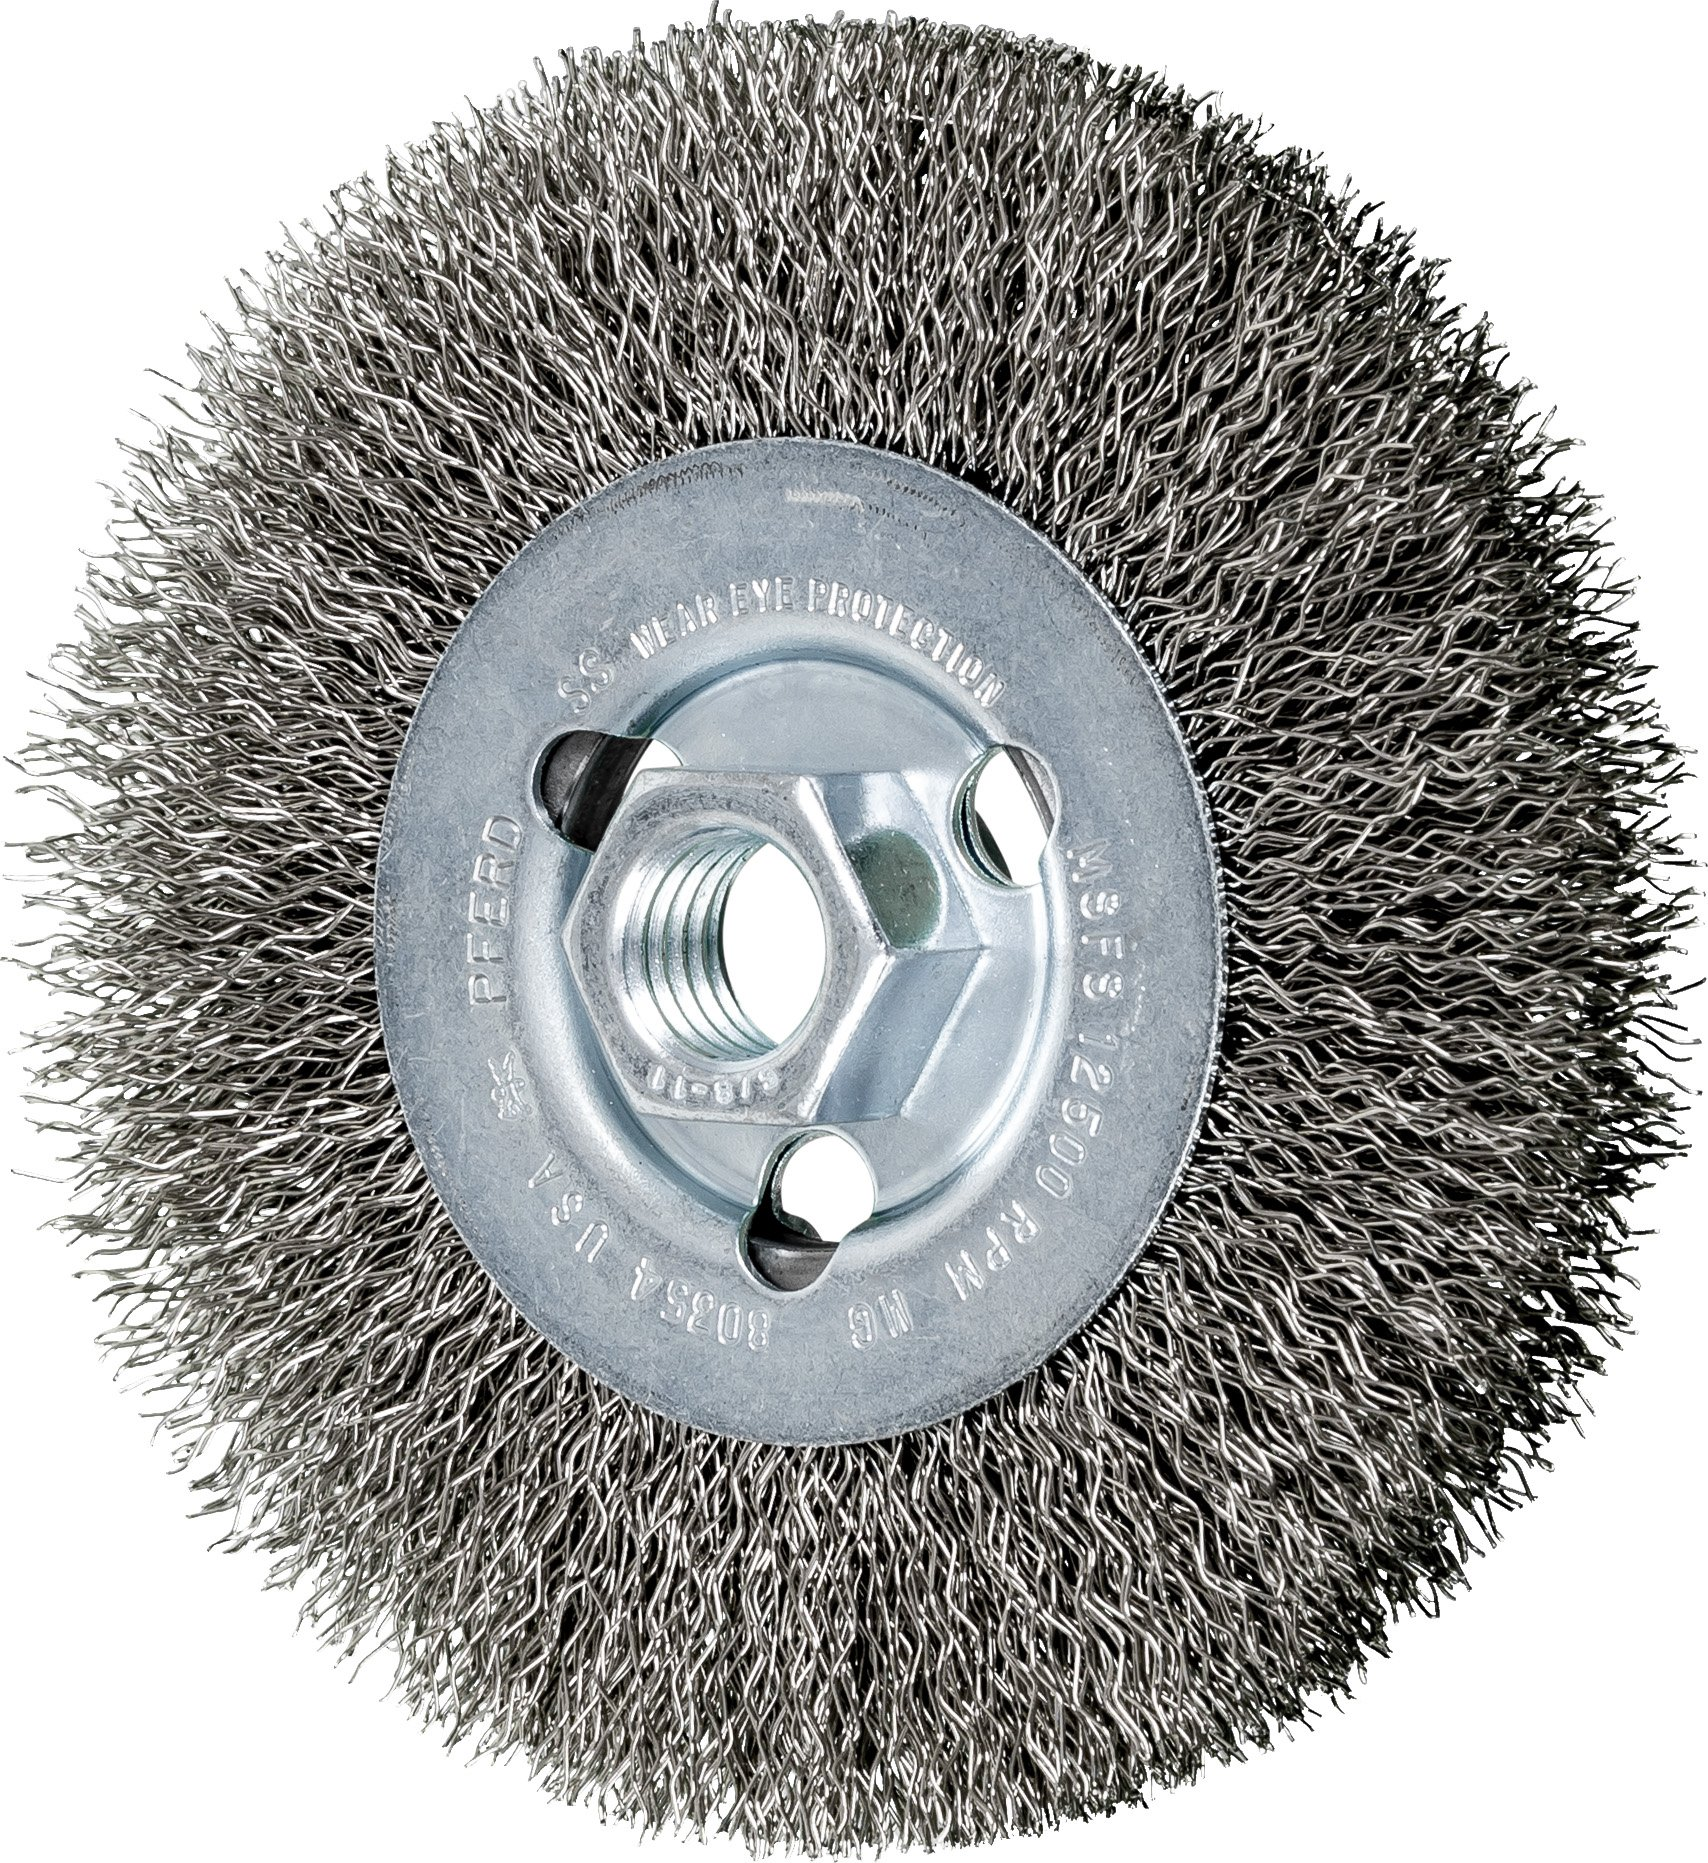 PFERD 80354 Crimped Wheel Brush, Stainless Steel Wire, 4-1/2'' Diameter, 5/8-11 Thread, 0.014 Wire Size, 15/16'' Trim Length, 1/2'' Face Width, 12500 RPM